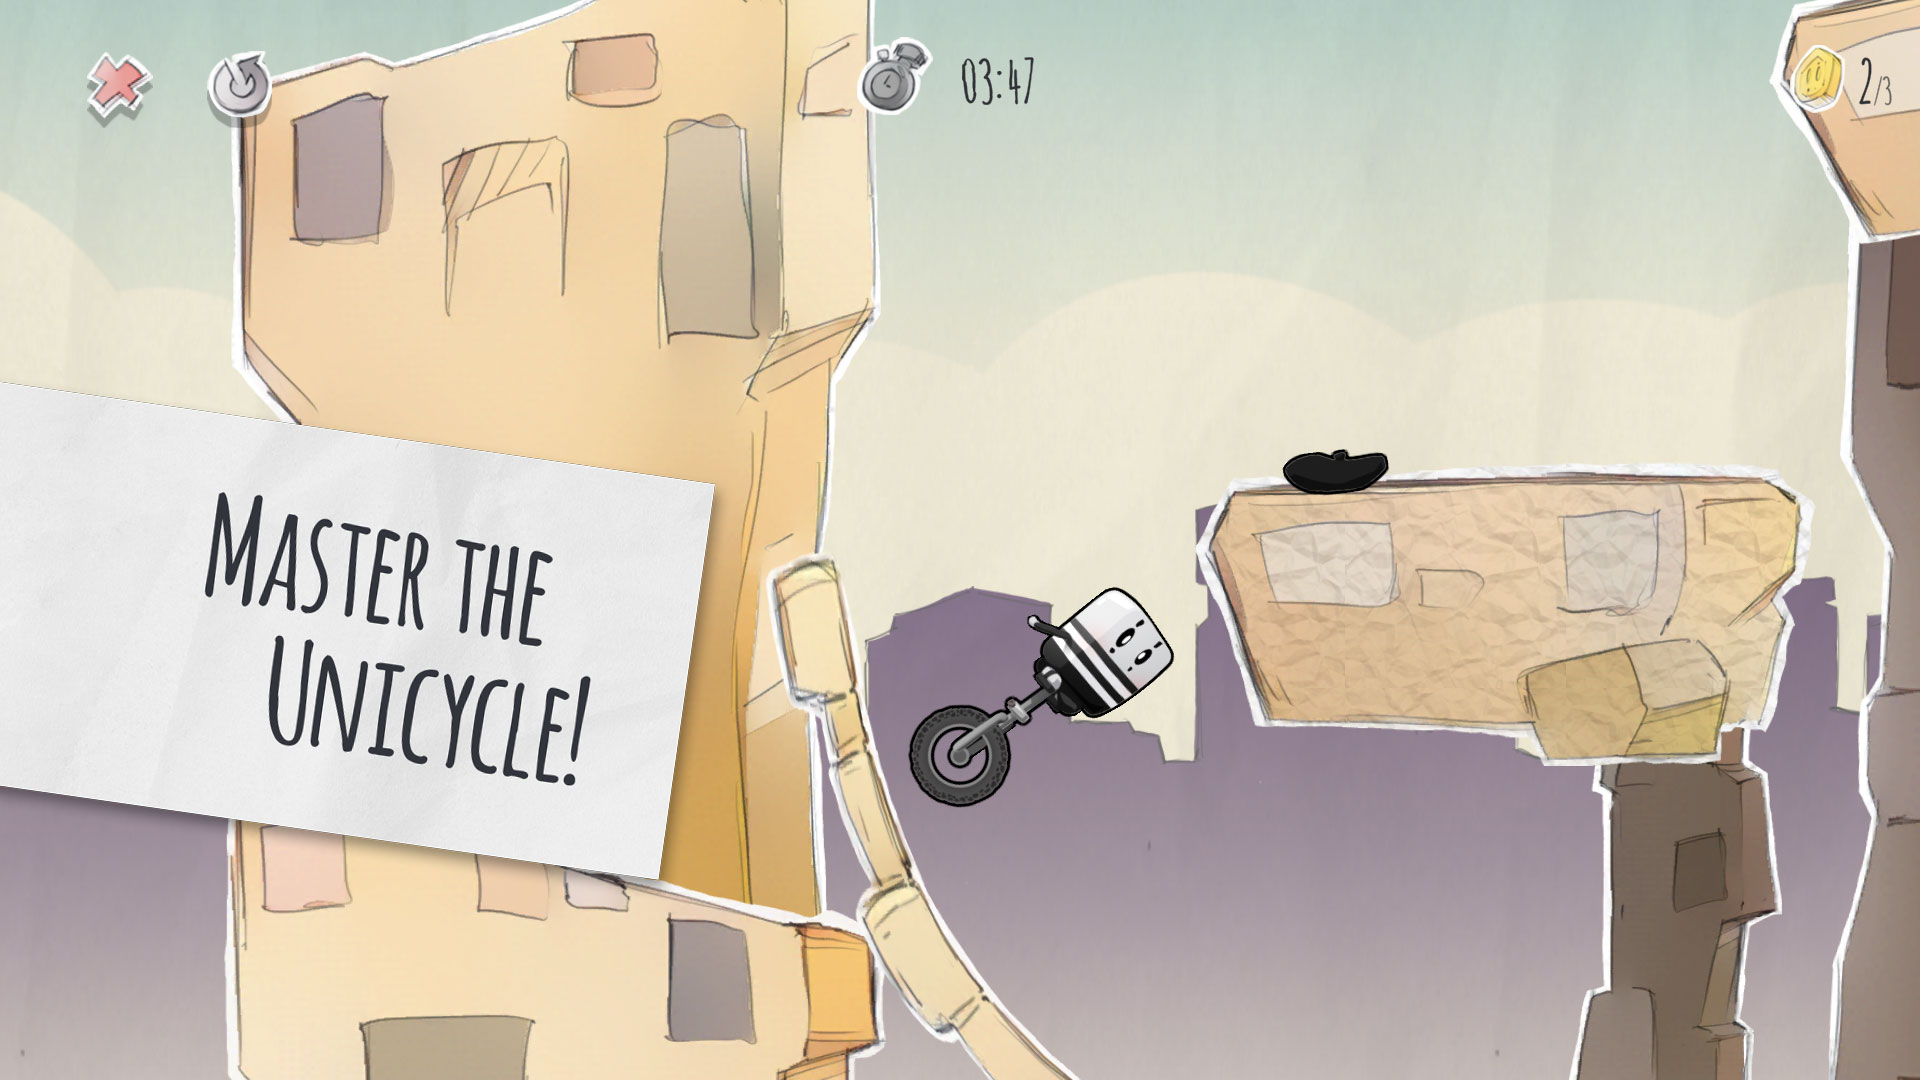 Unimime - Master The Unicycle